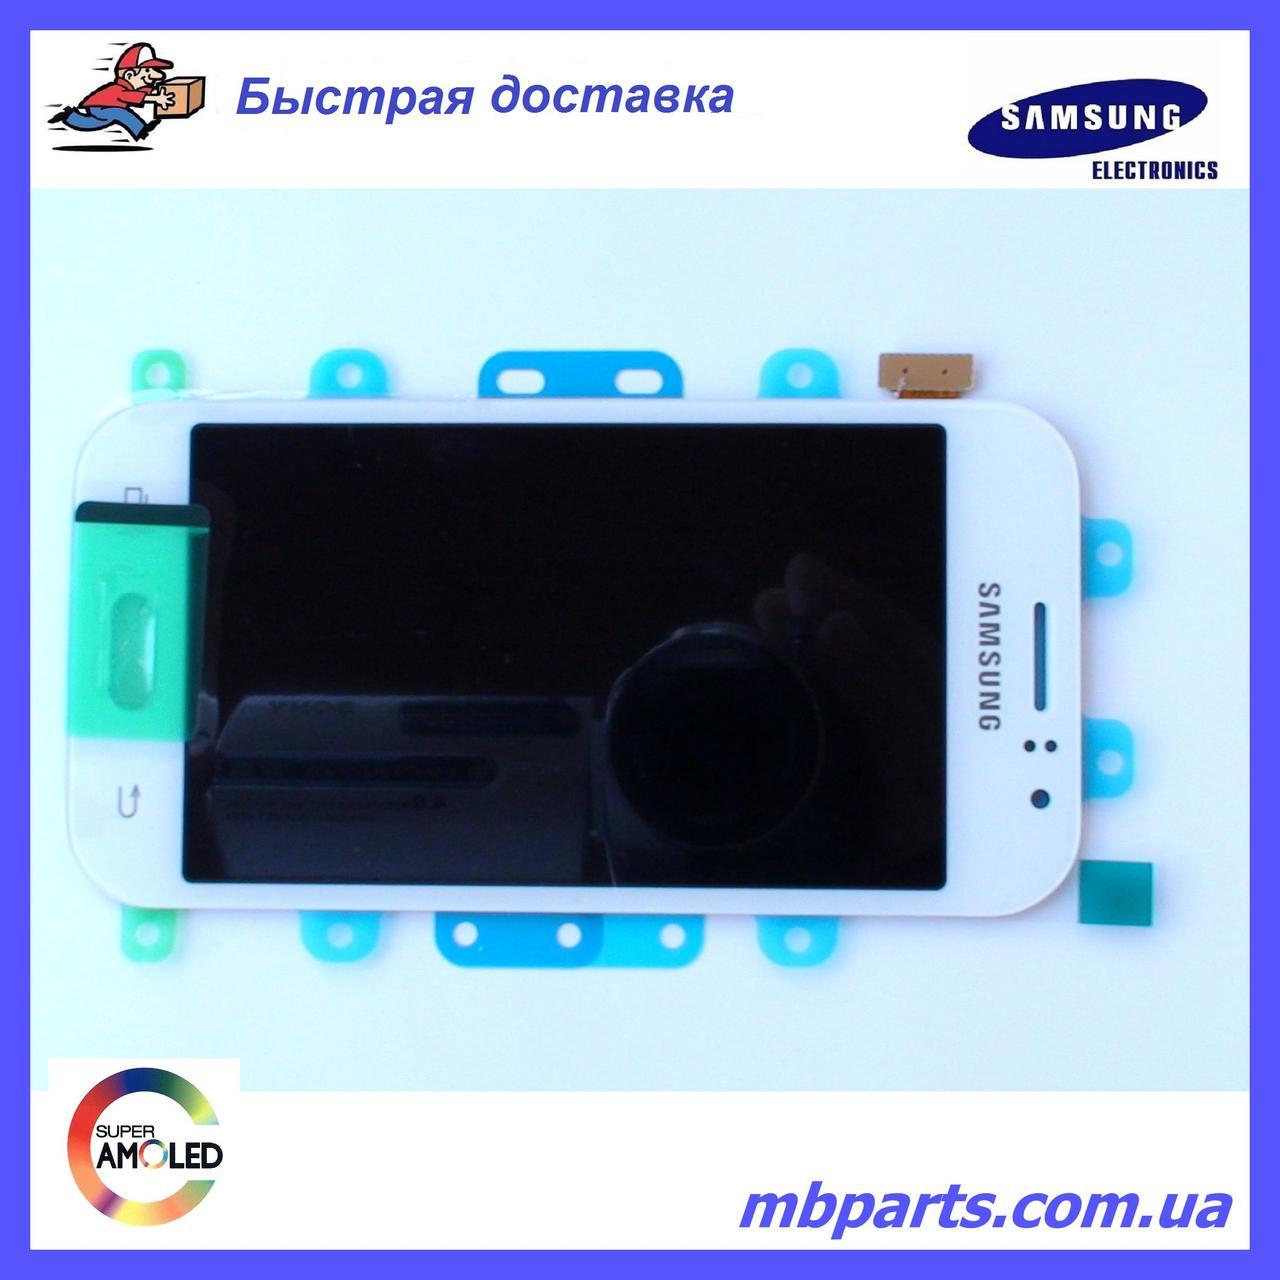 Дисплей з сенсором Samsung моделі j110 Galaxy J1 White оригінал, GH97-17843A